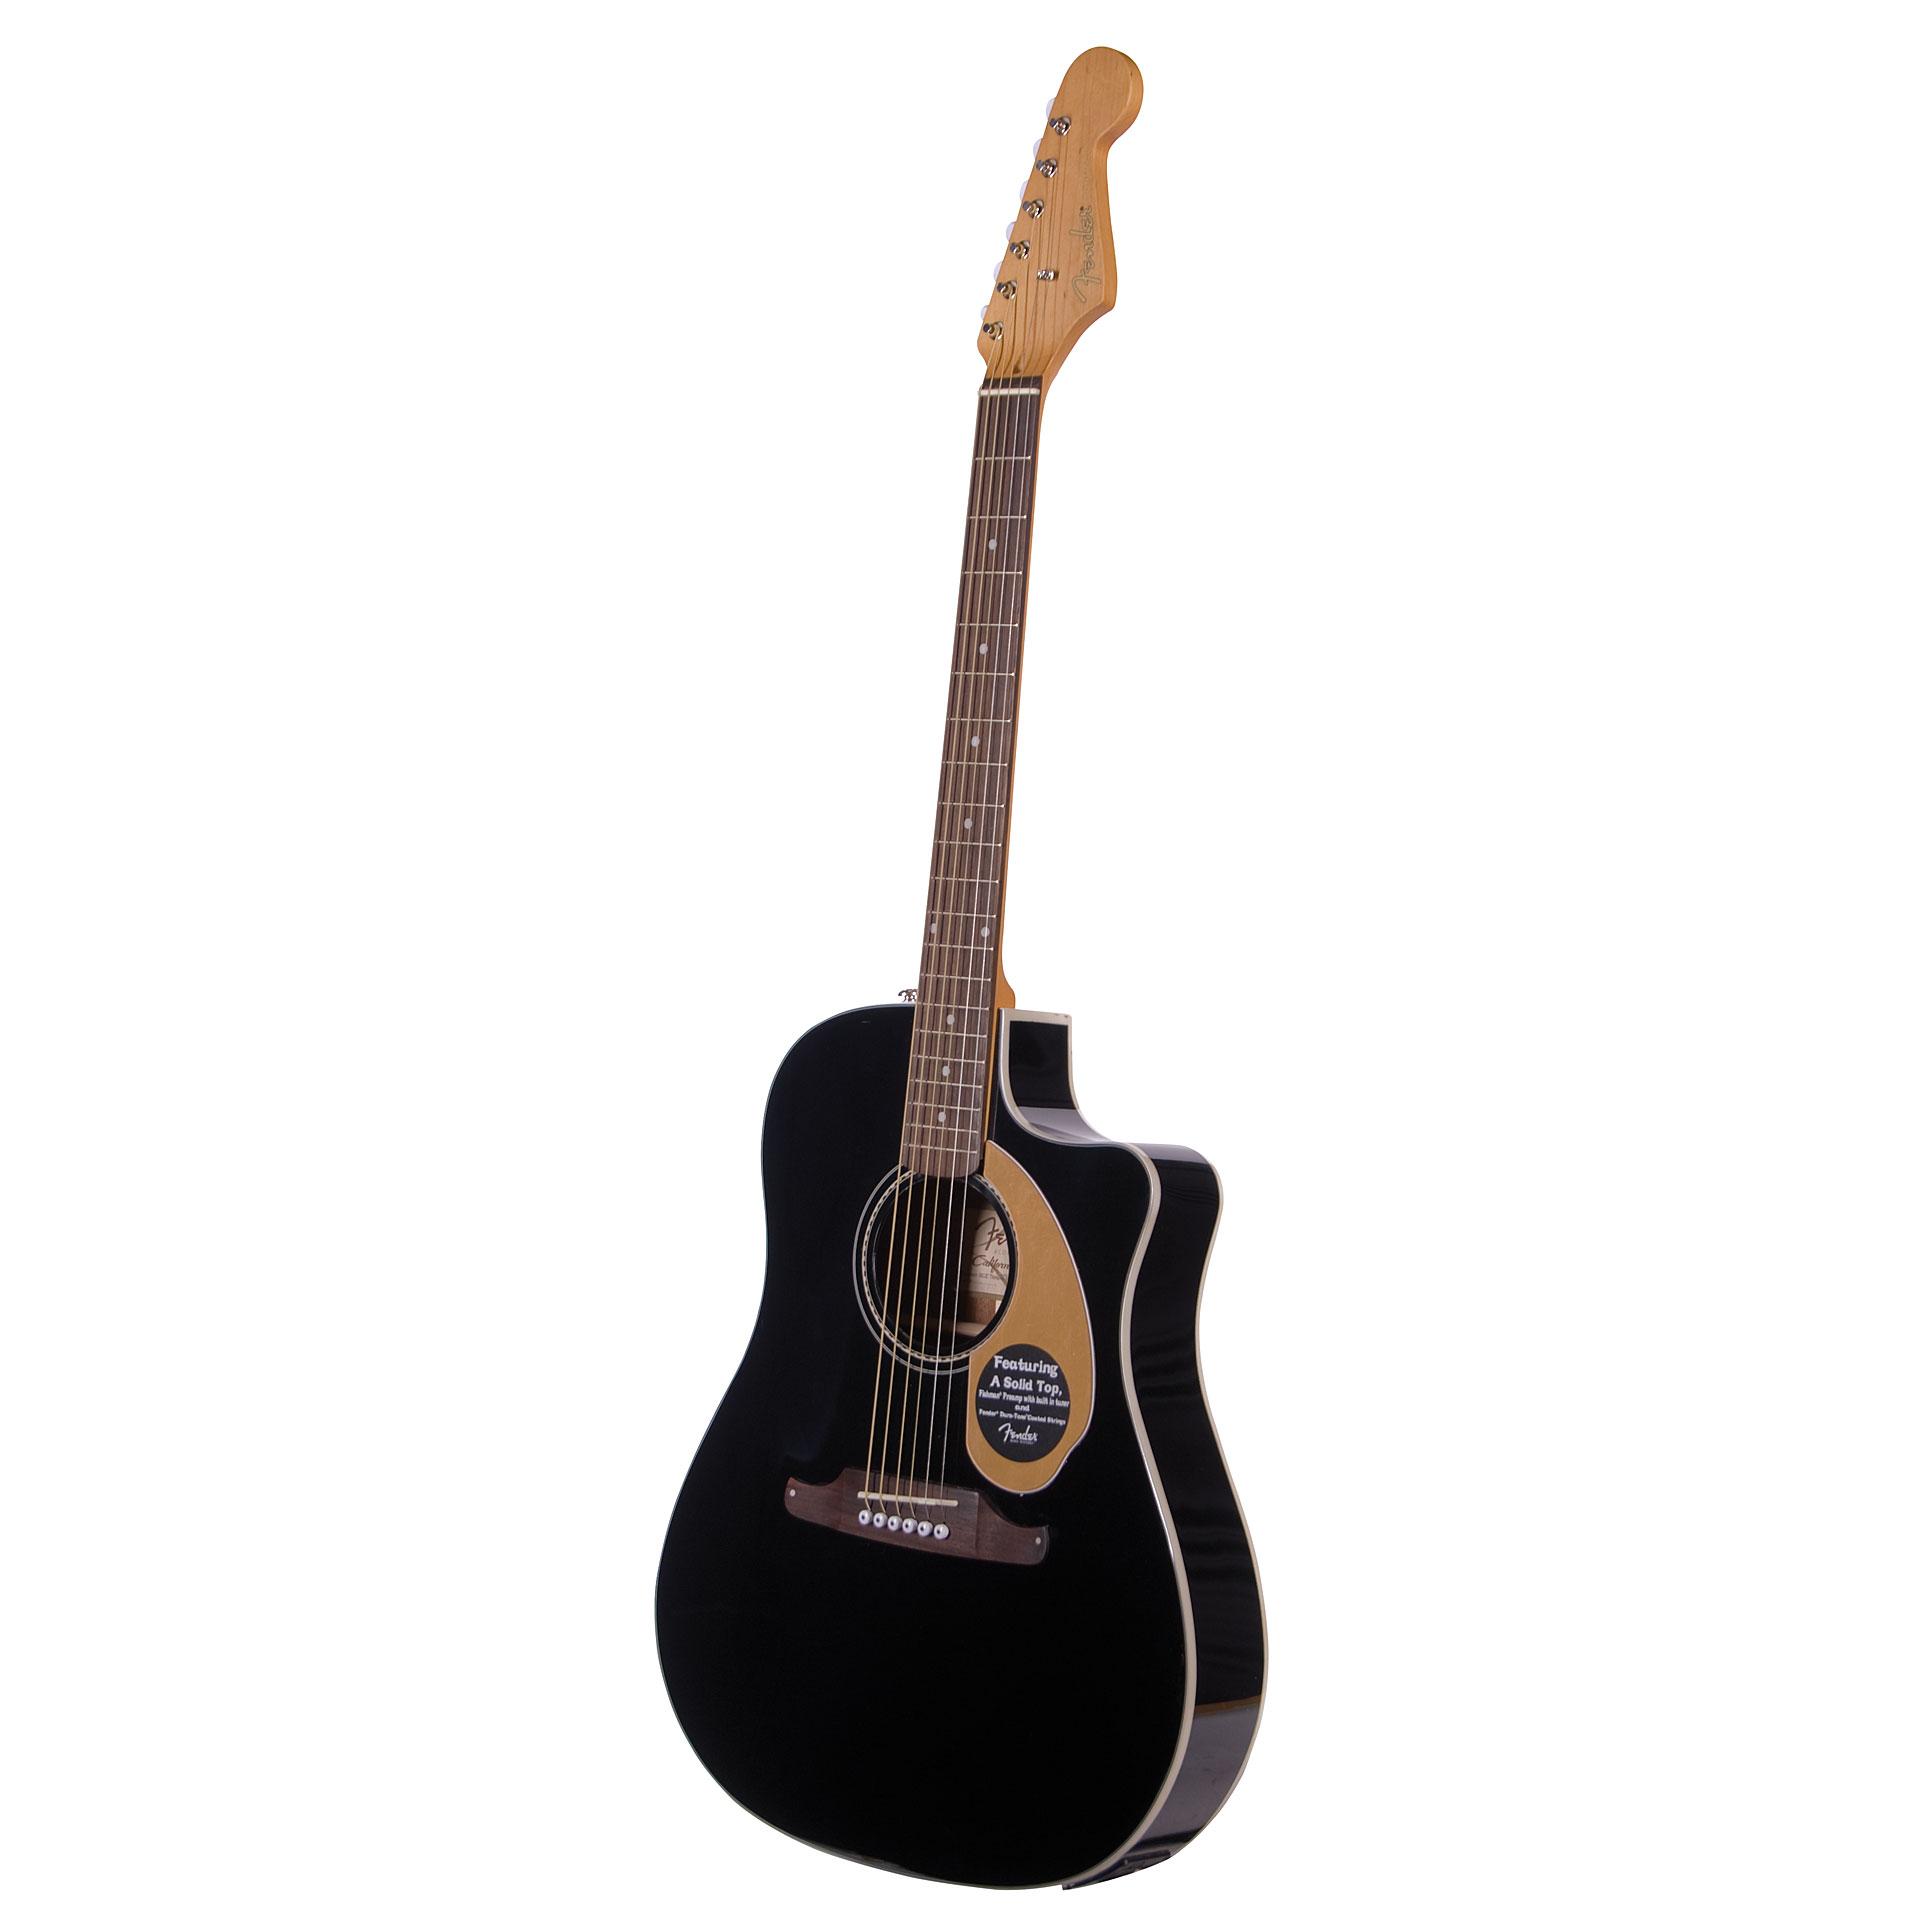 fender sonoran sce thinline blk acoustic guitar. Black Bedroom Furniture Sets. Home Design Ideas